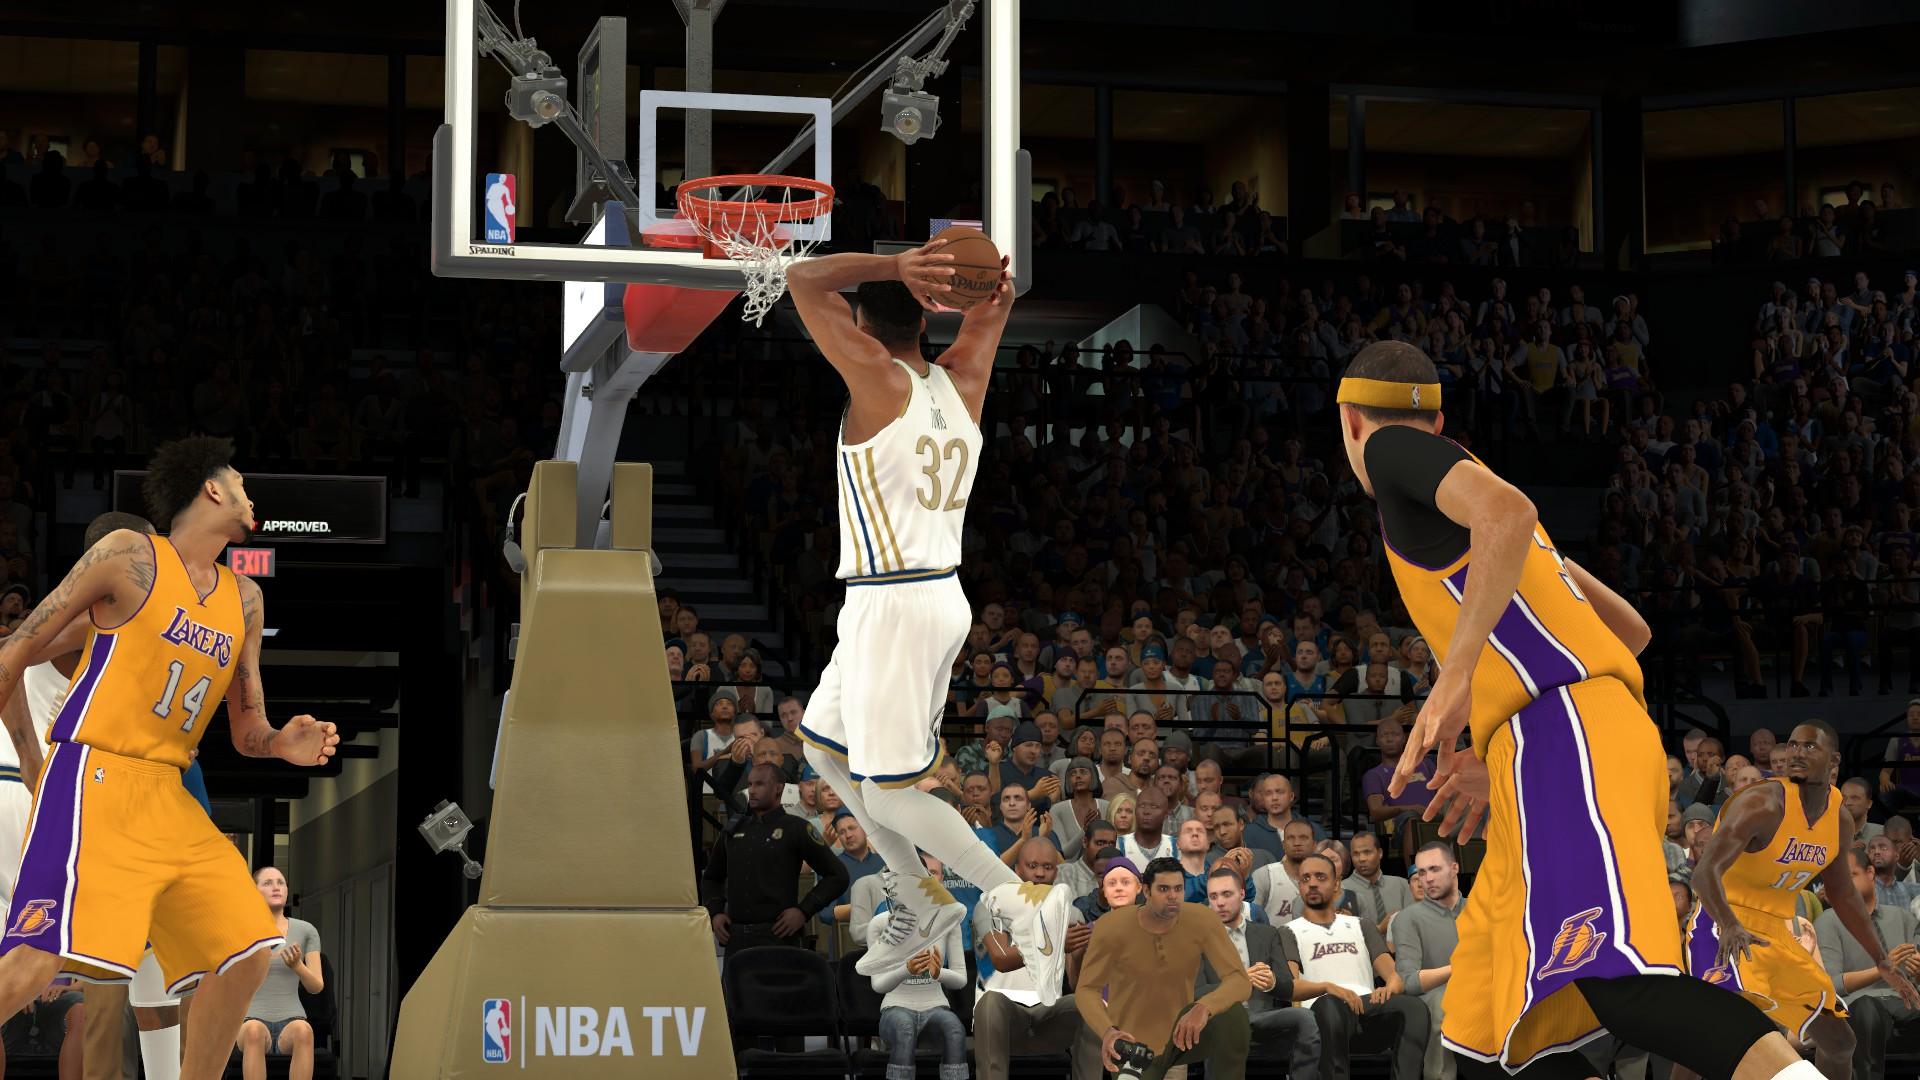 《NBA 2K17》NBA球迷的狂欢节1